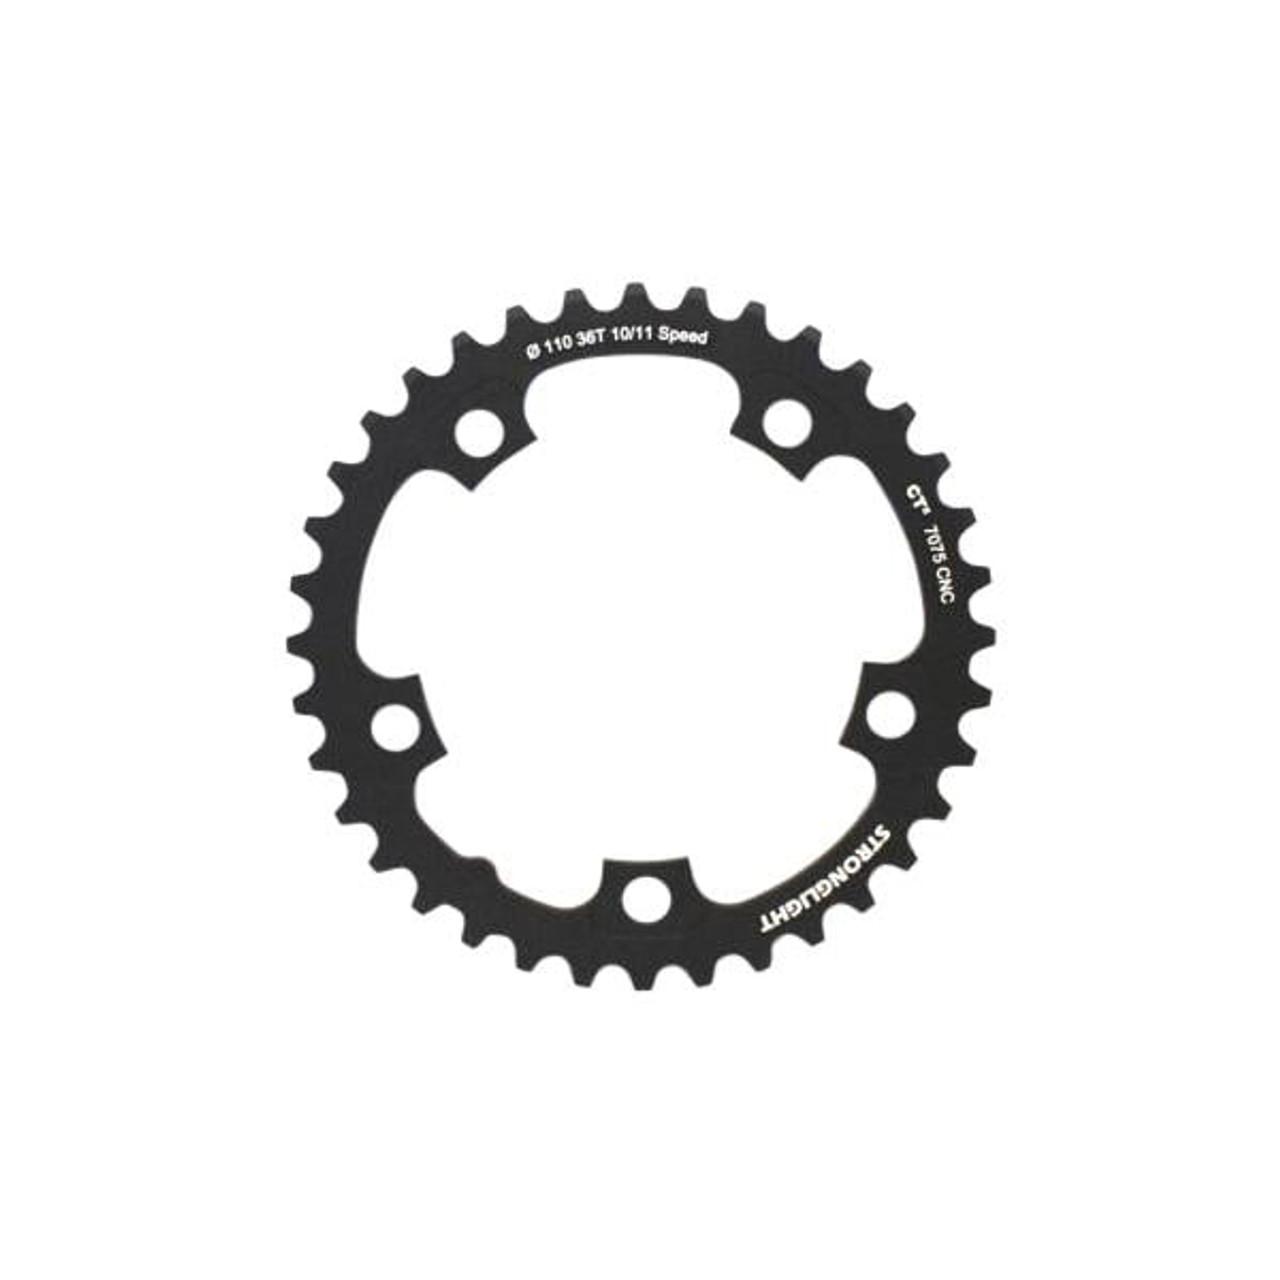 Stronglight / Ultegra 6700 Inner Chainring | 130mm BCD | All Sizes